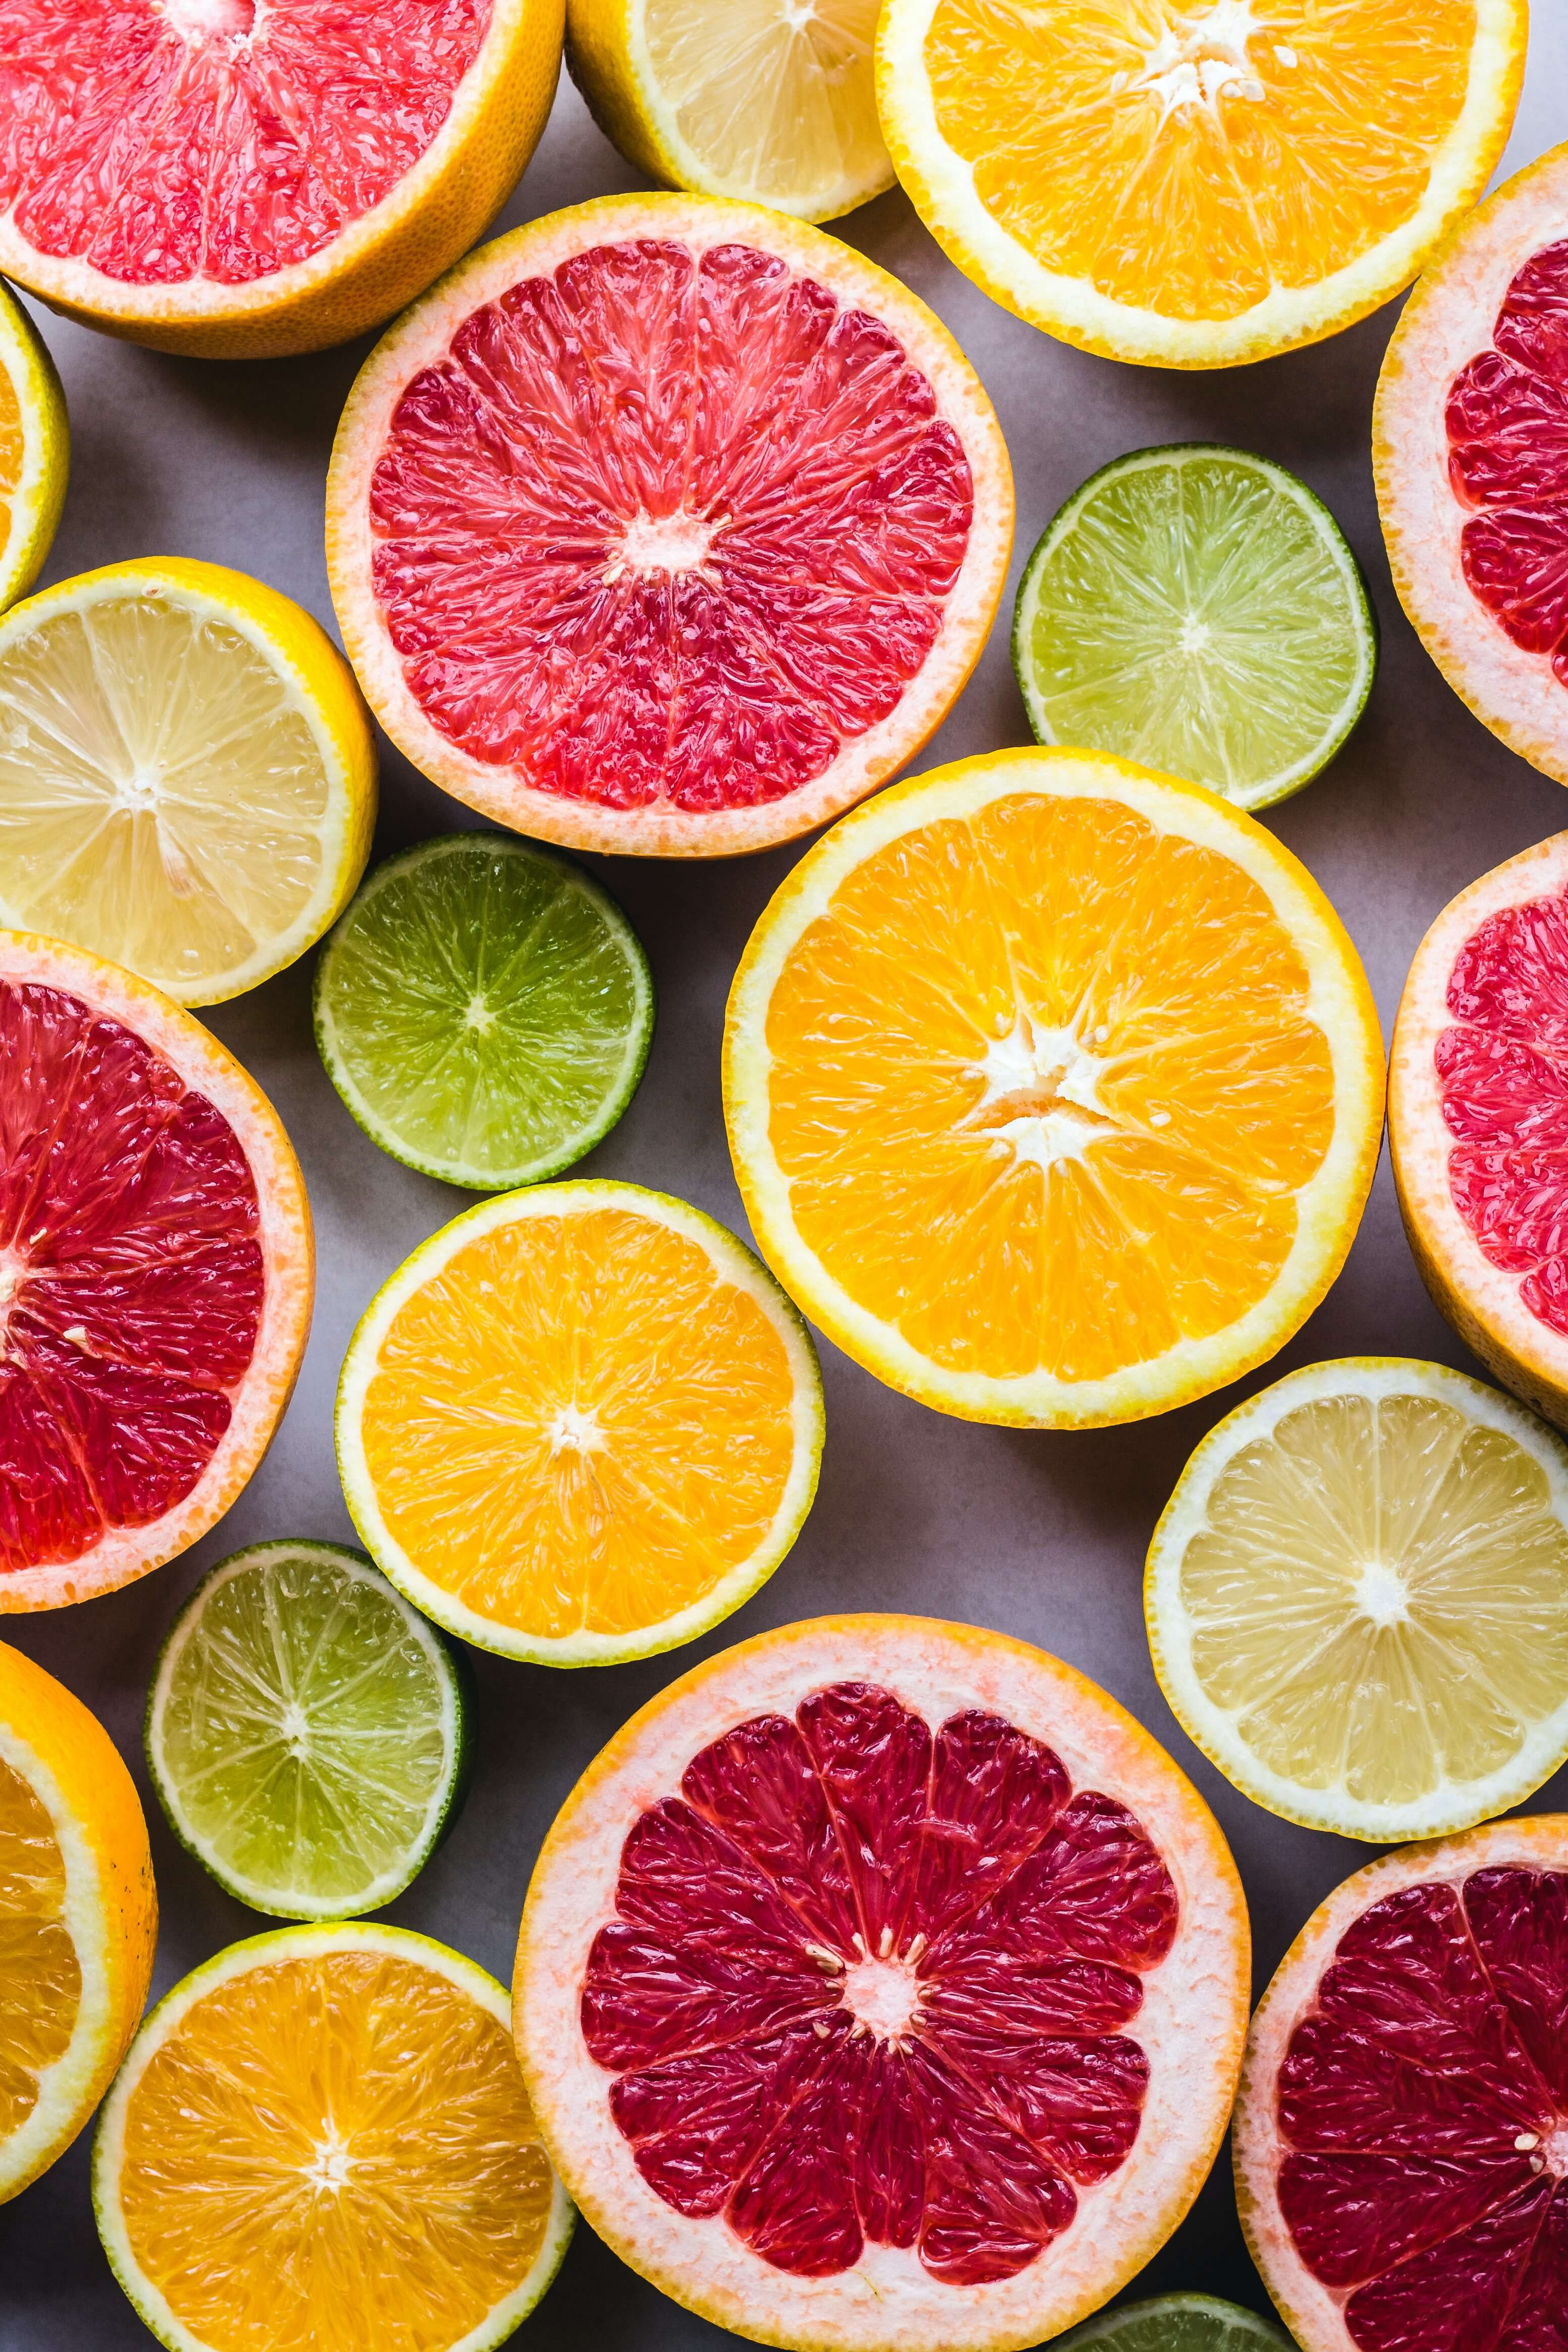 Natural remedies for vaginal thrush